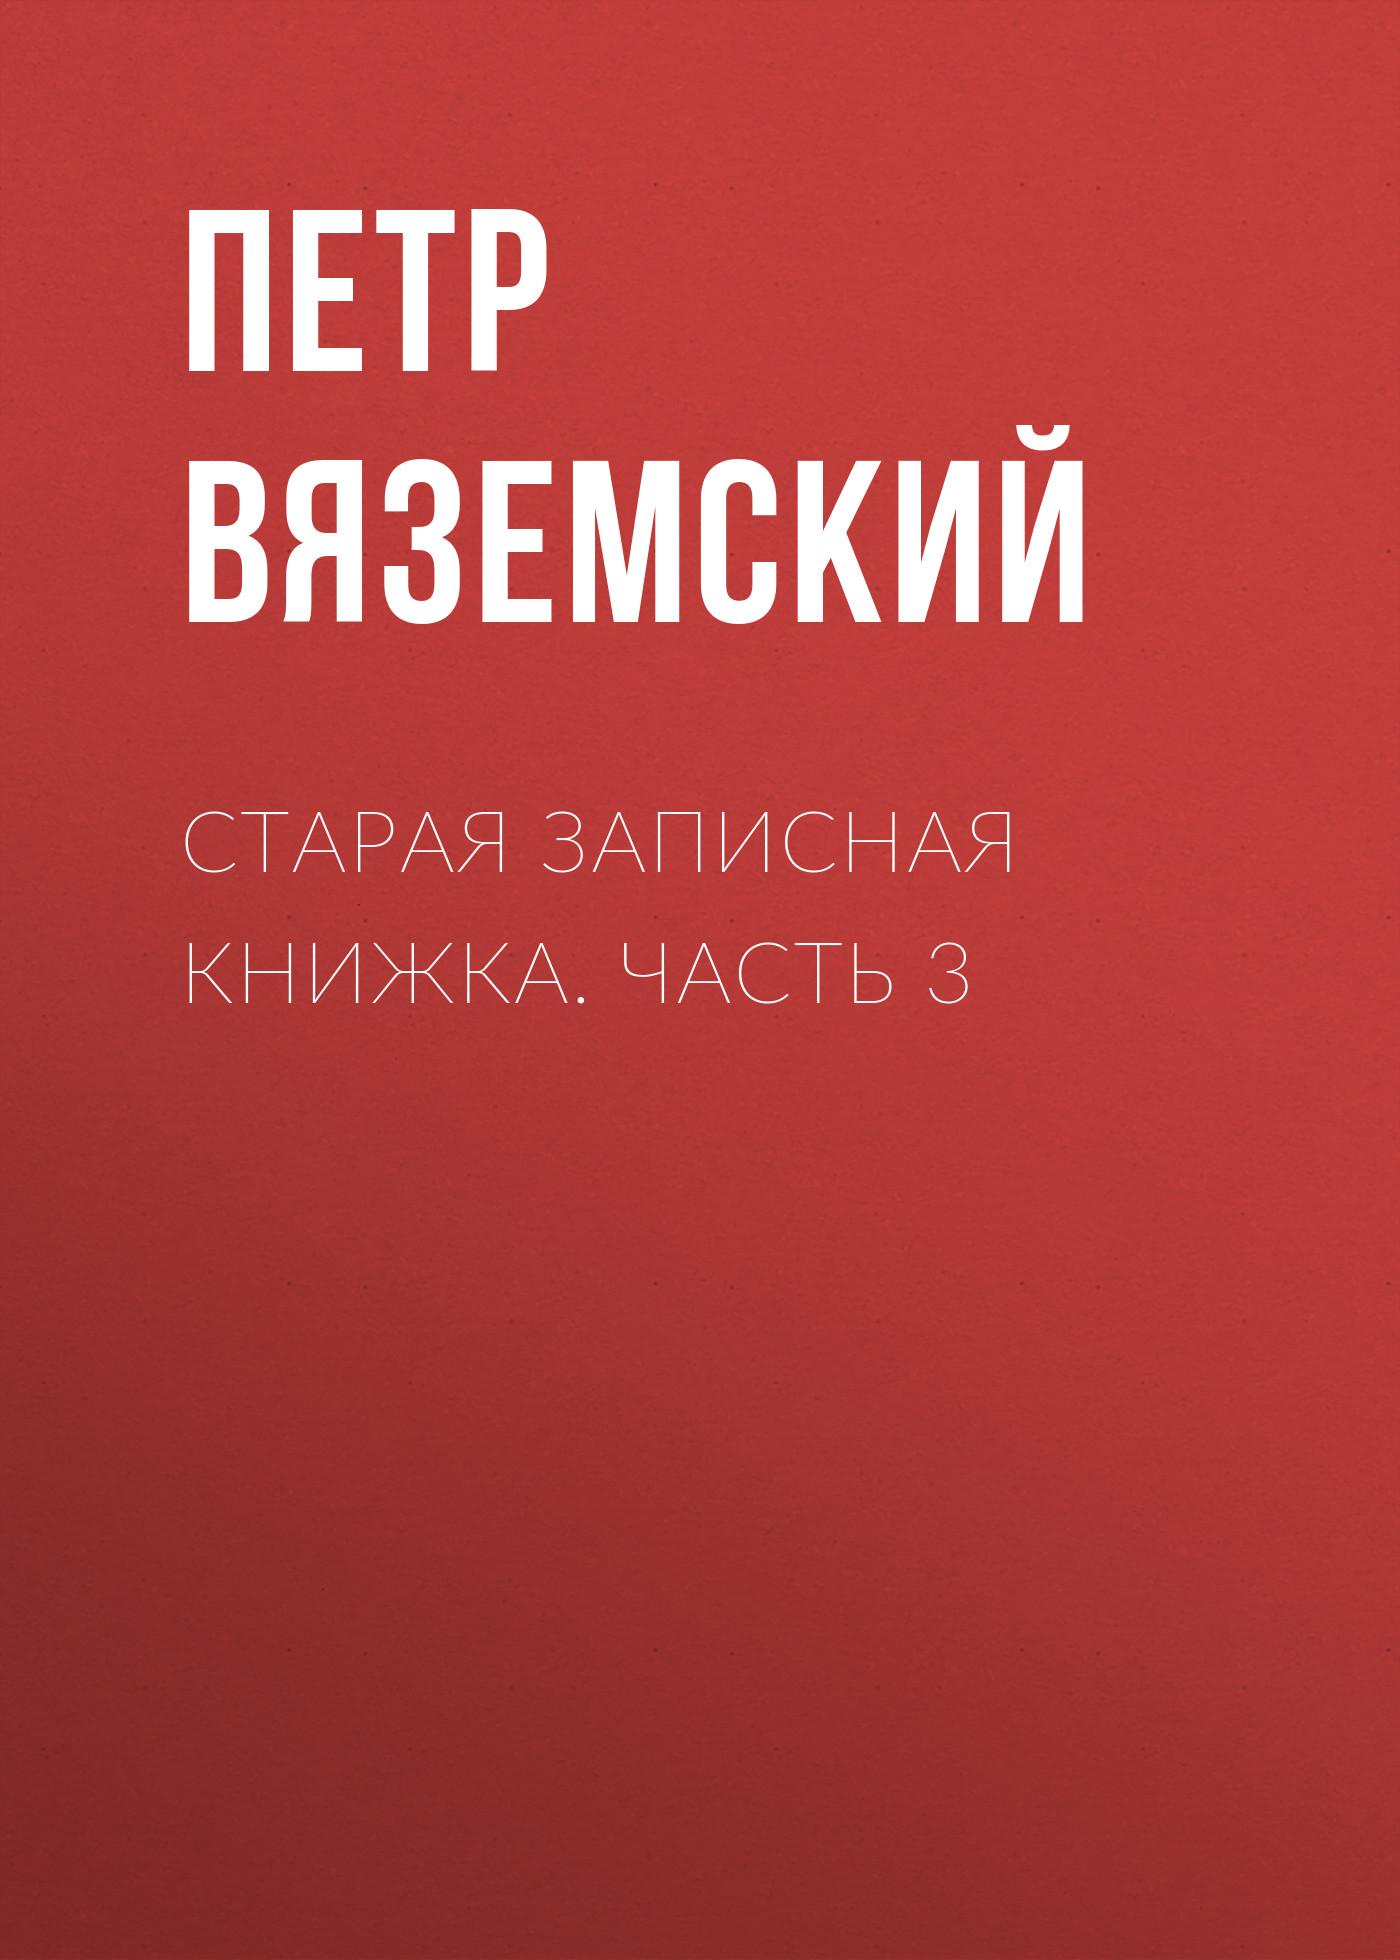 Петр Вяземский Старая записная книжка. Часть 3 prosper merimee carmen isbn 9789949480647